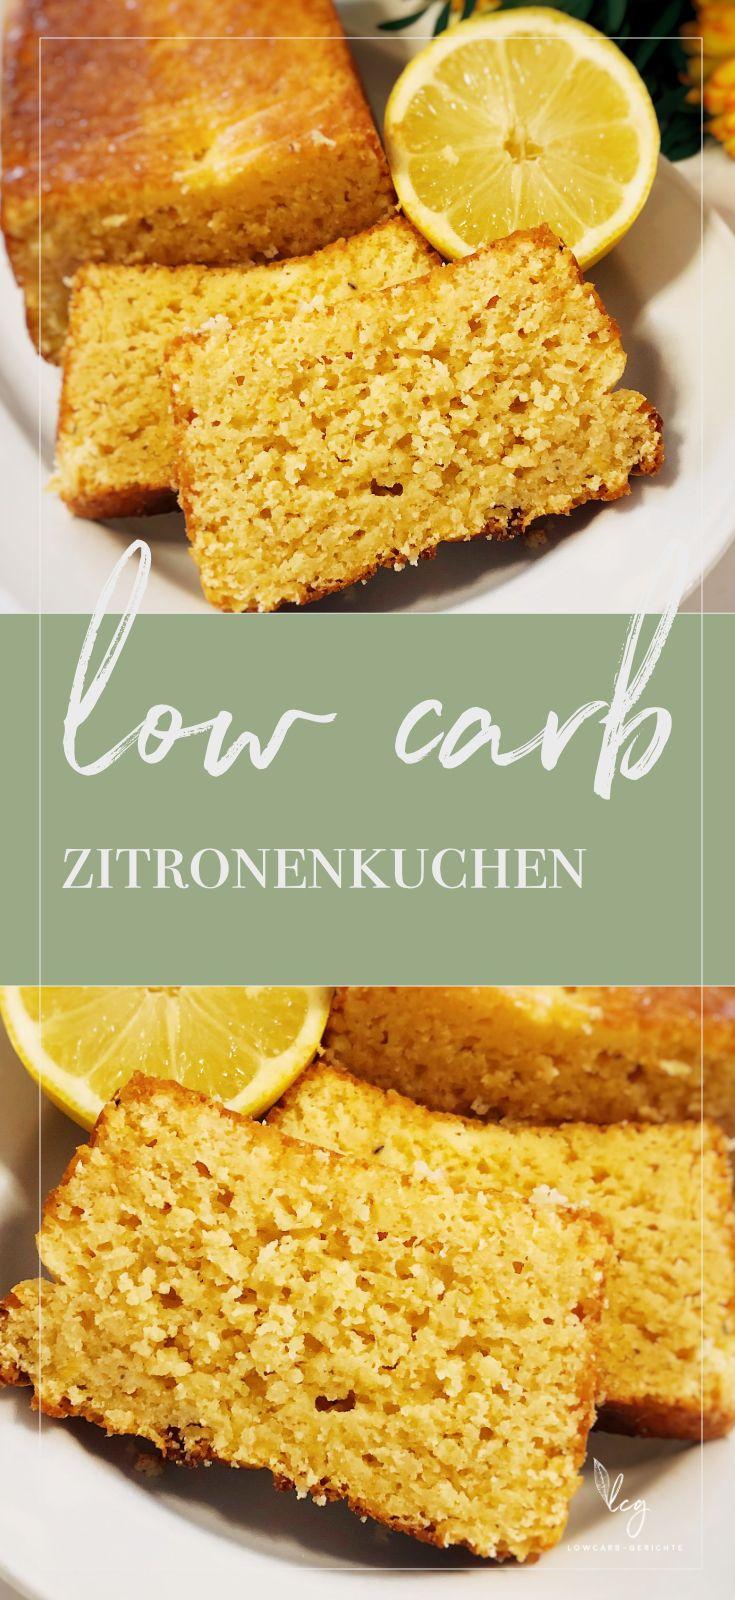 Zitronenkuchen Uberzeugendes Low Carb Rezept So Lecker Zitronen Kuchen Zitronenkuchen Low Carb Rezepte